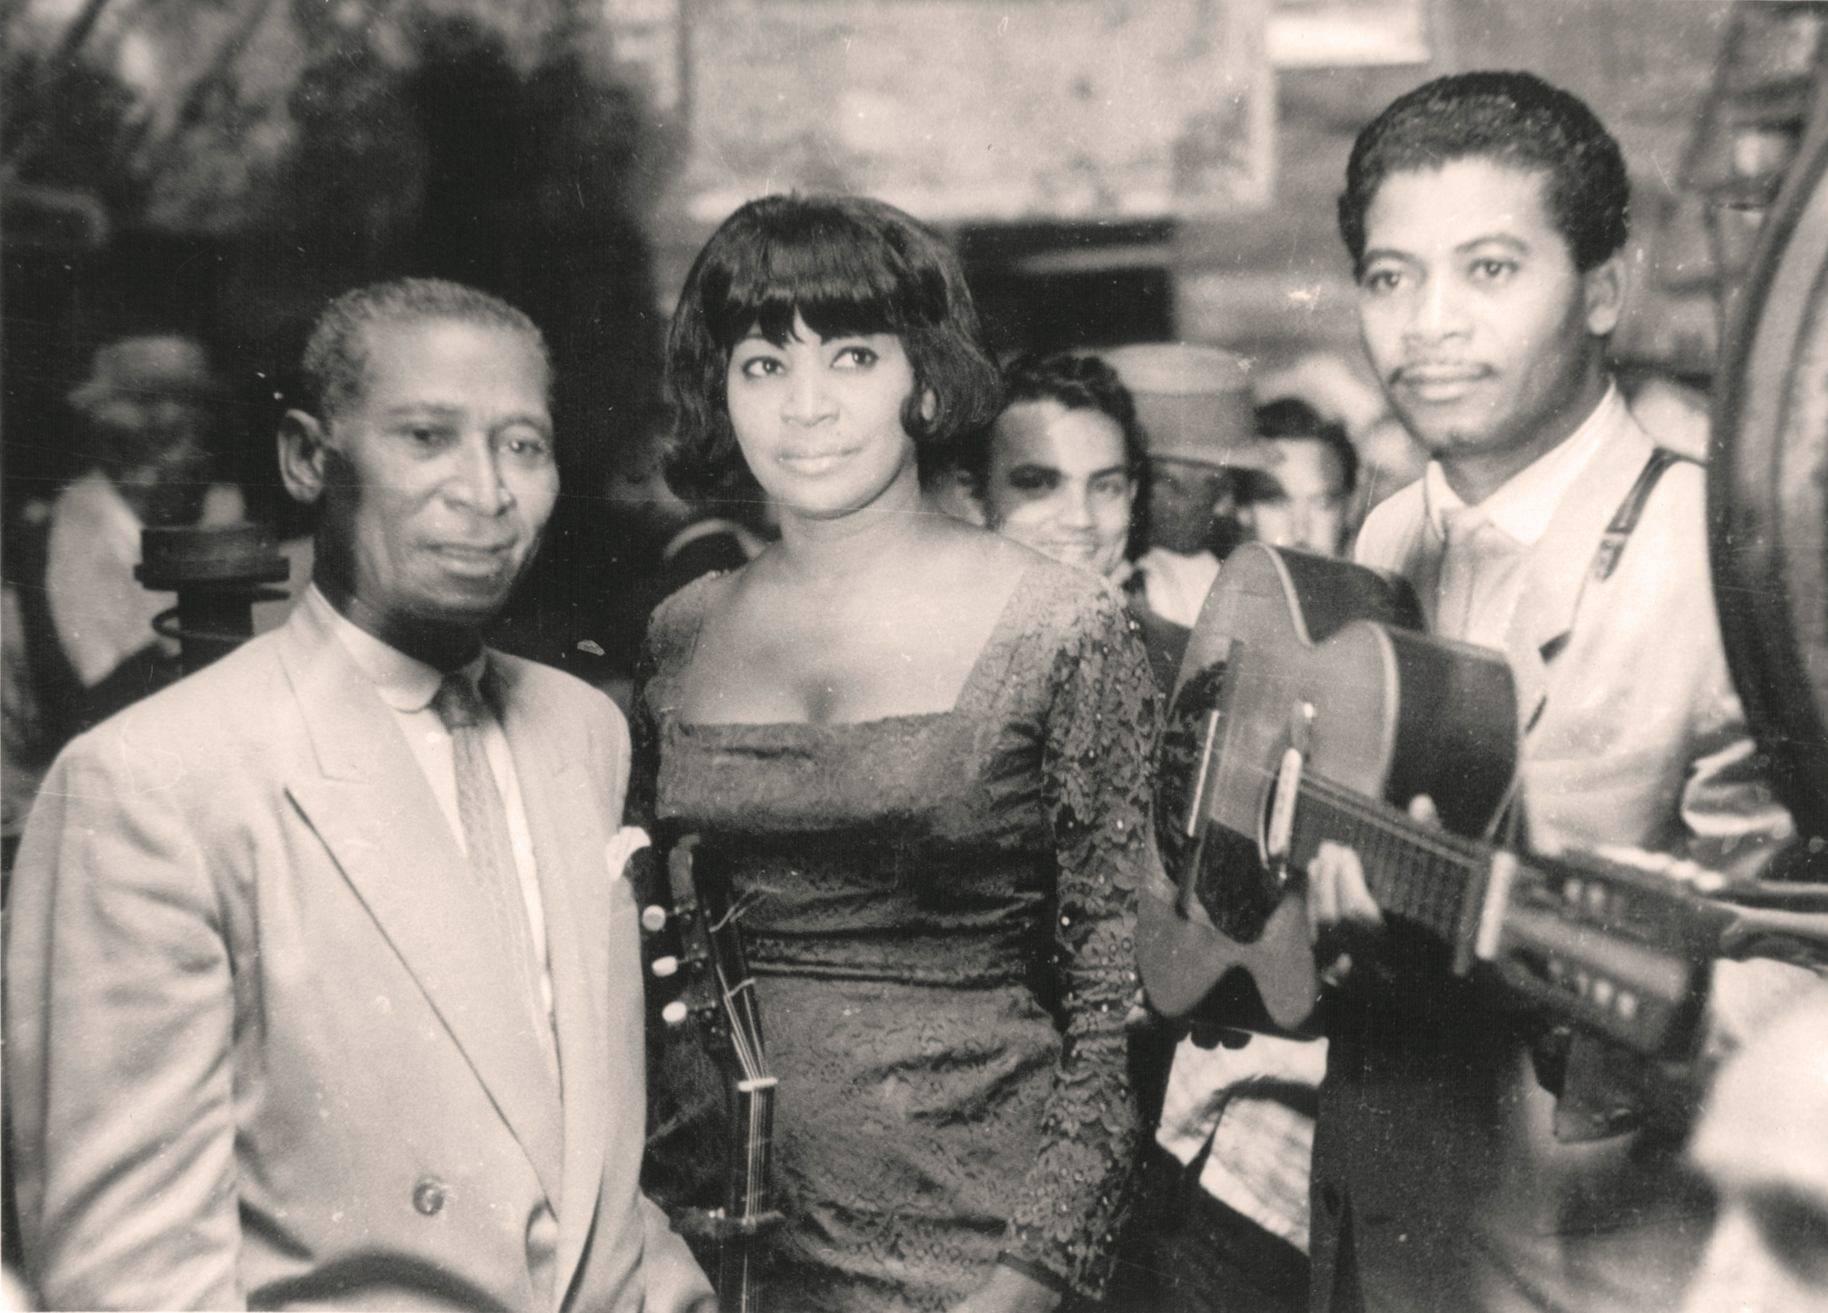 From left to right: Lorenzo, Caridad and Reinaldo Hierrezuelo. Photo: Smoke Graphic.